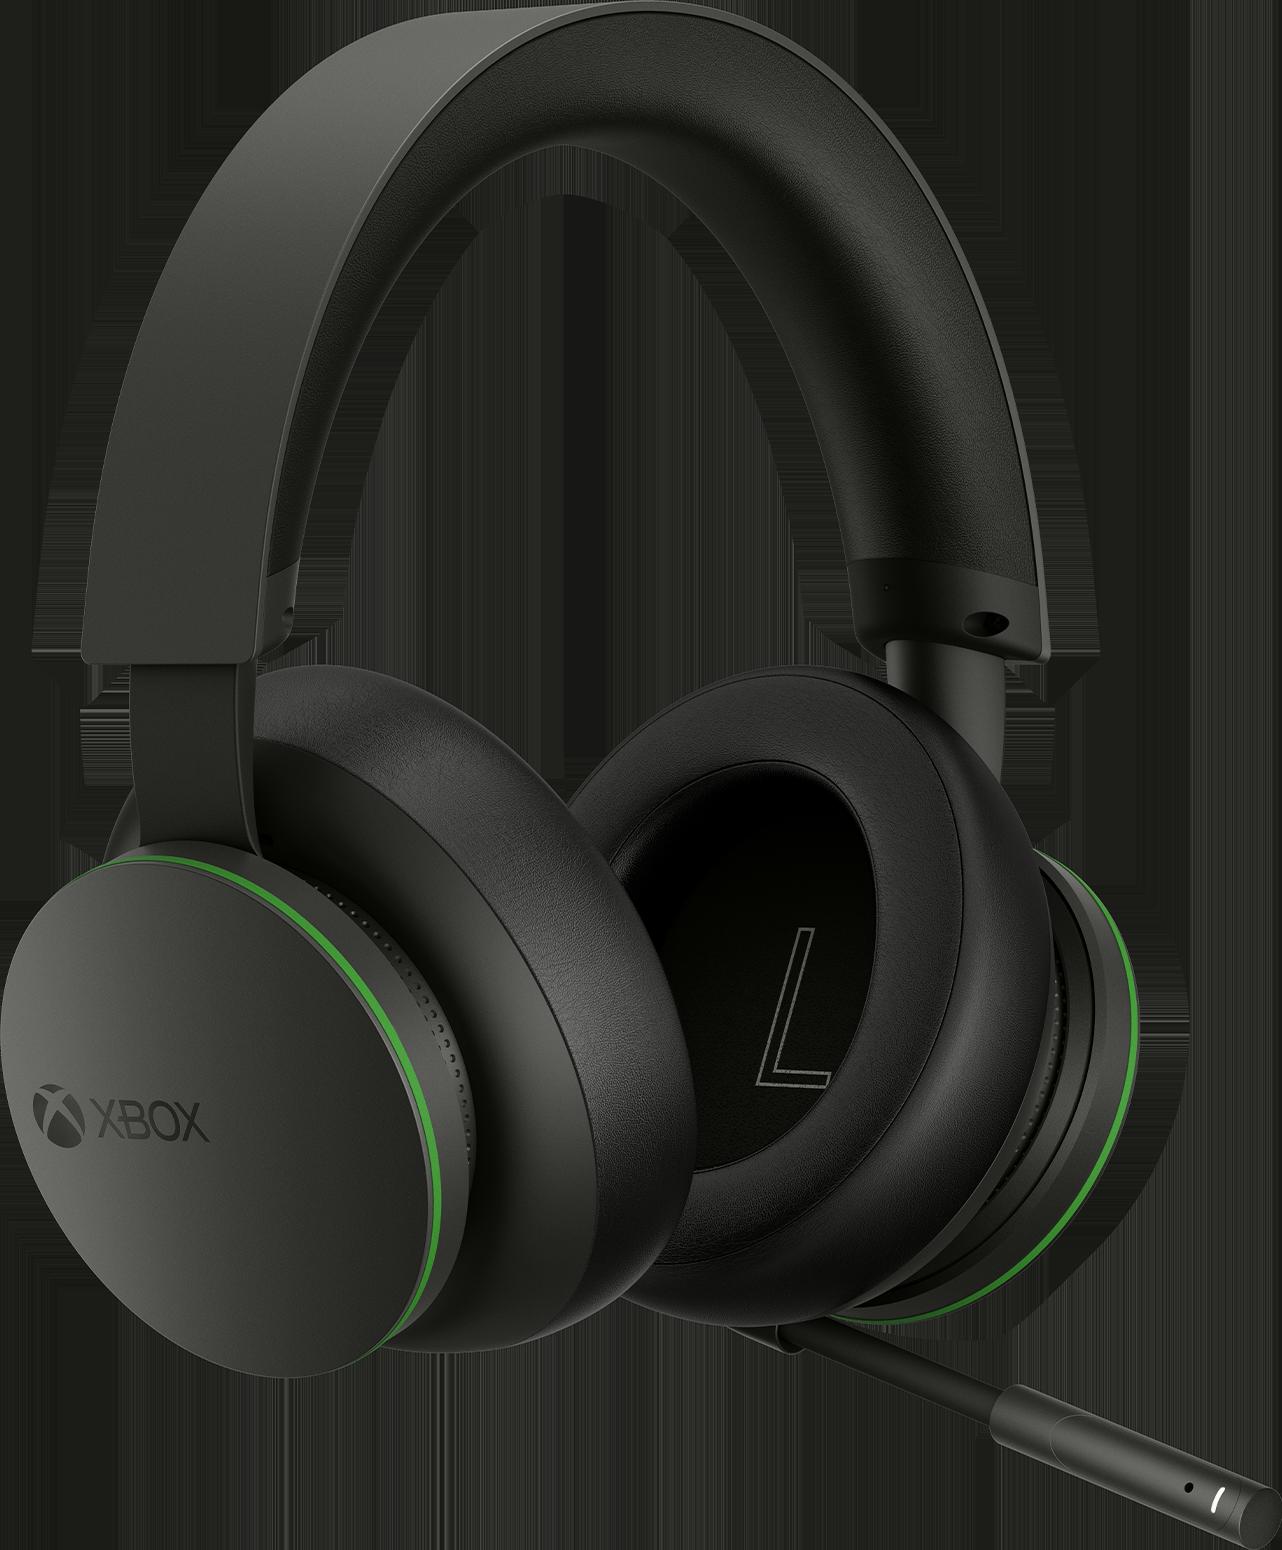 Image of Xbox Wireless Headset